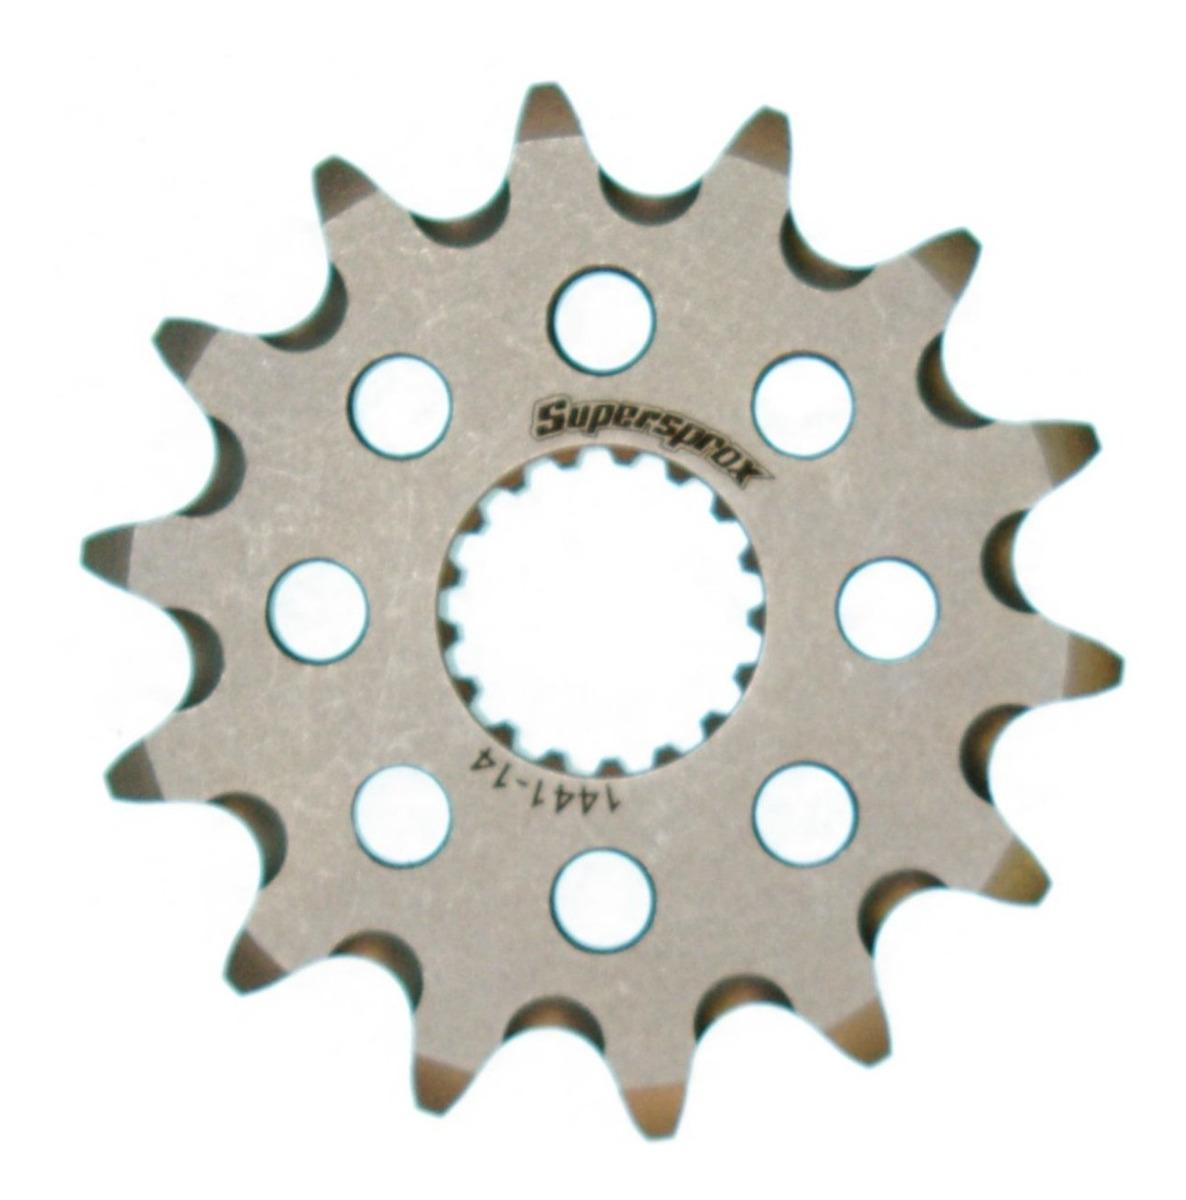 piñon acero superprox 1441 14T-520 SUZUKI RMZ 450 (2005-2012)